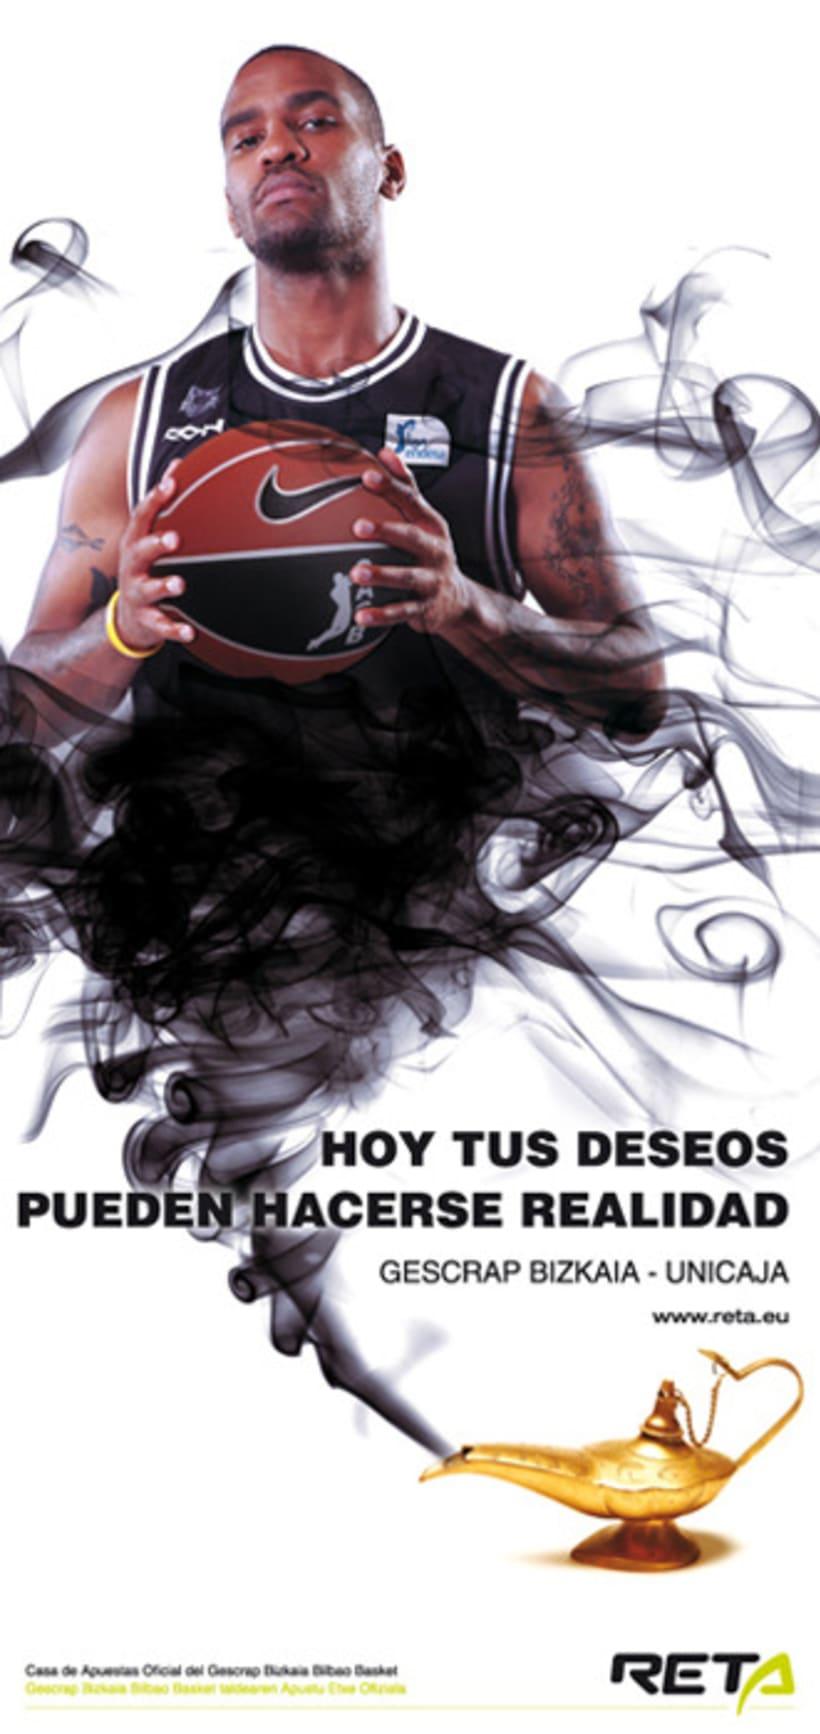 Boletín Bilbao Basket 2